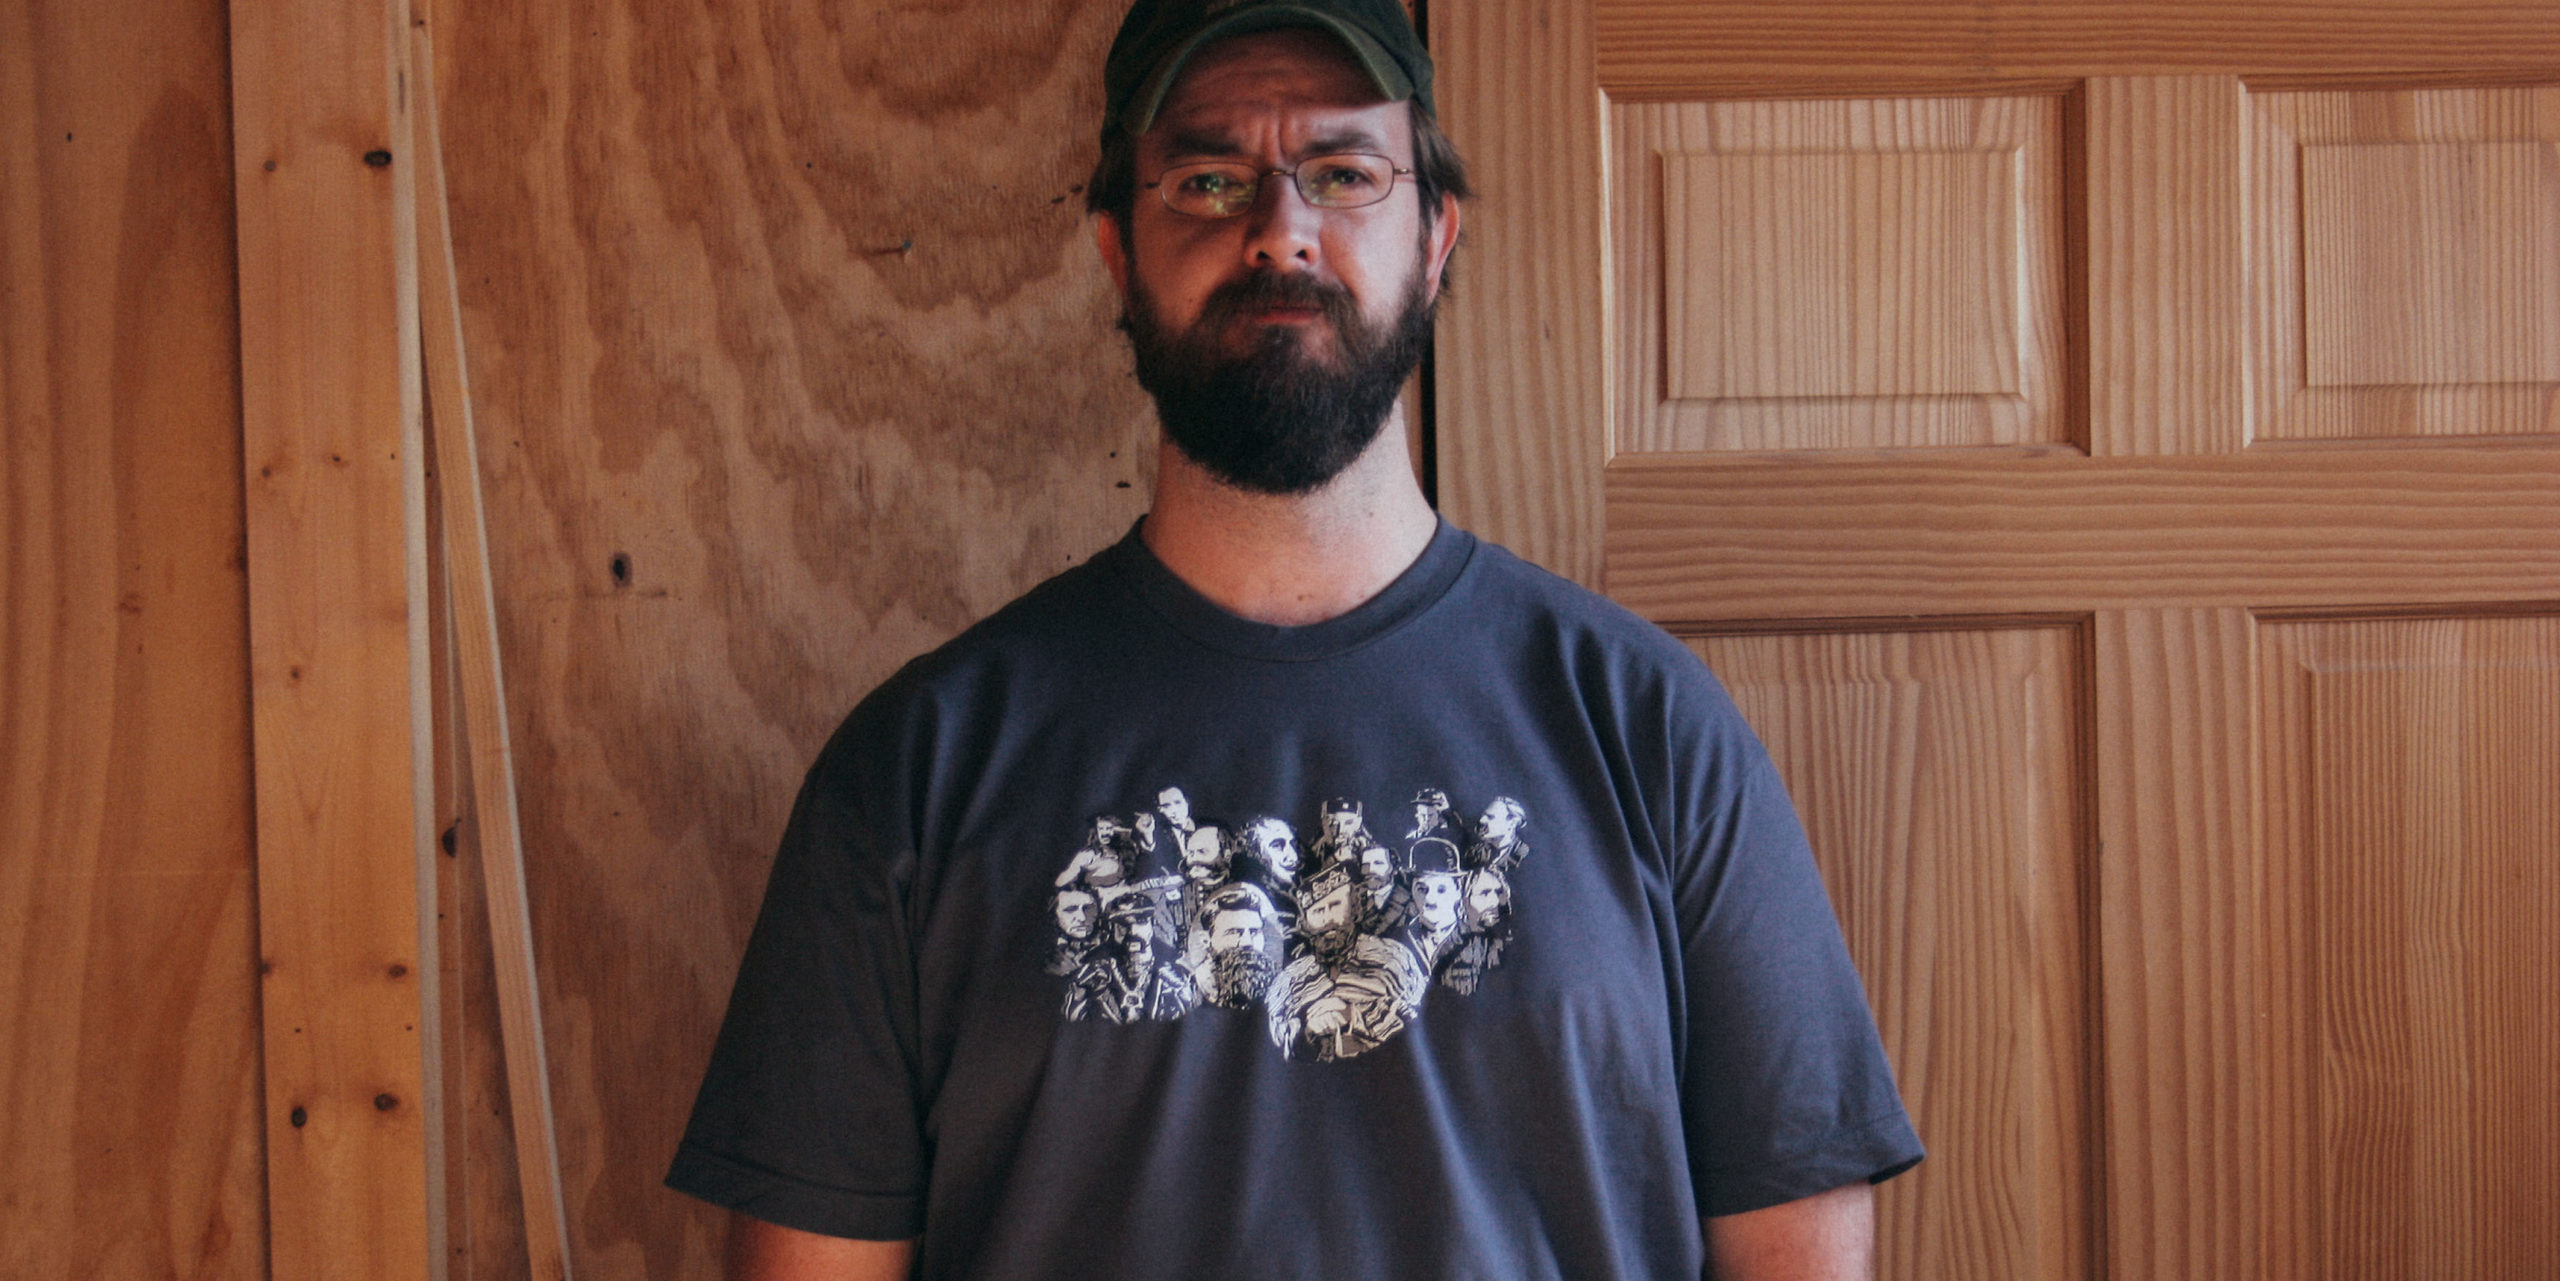 Chris Glass wearing the Beardshirt